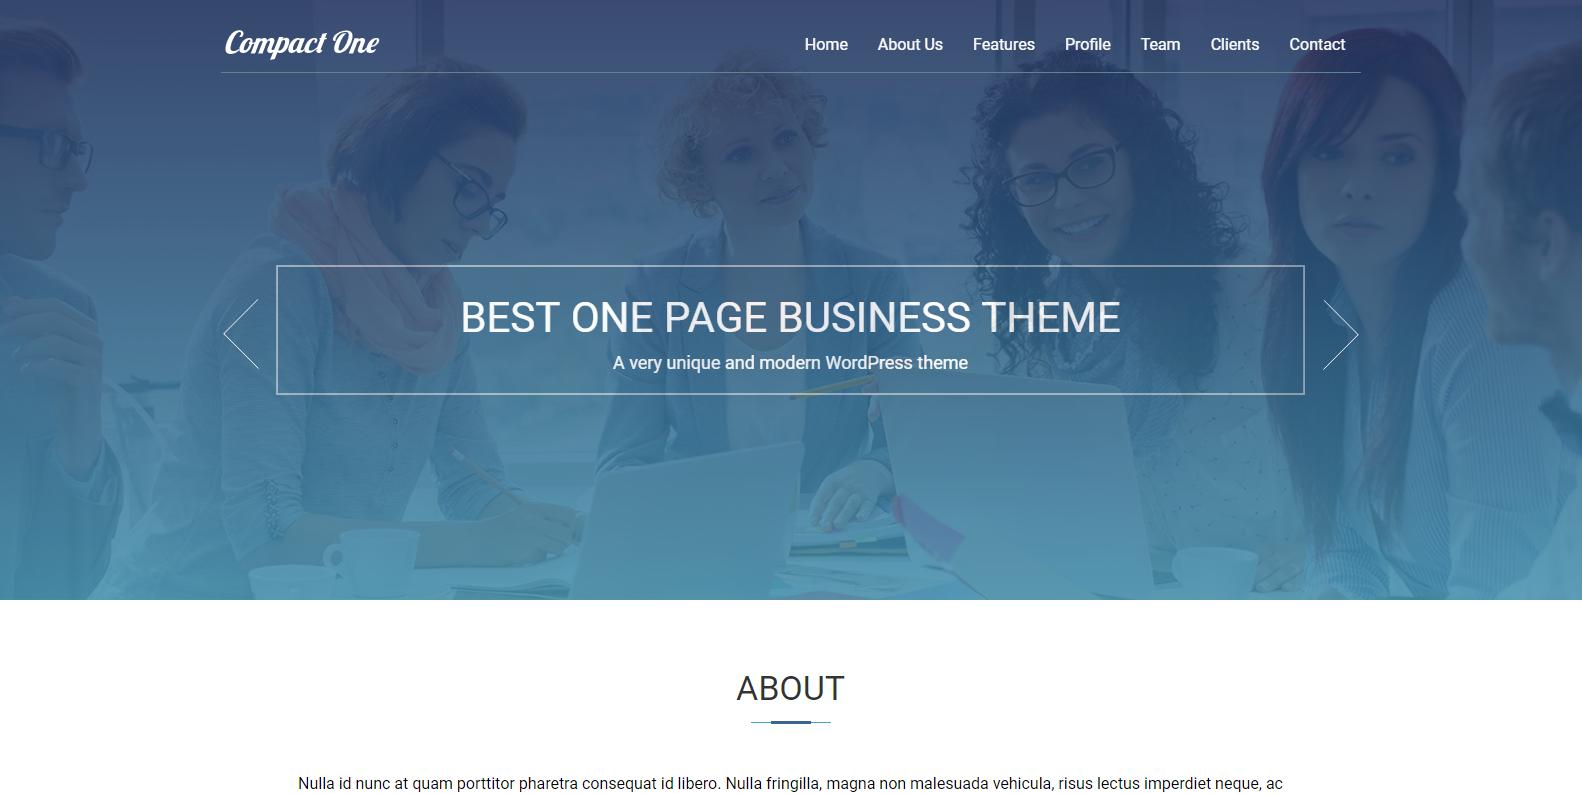 WordPress高质量设计公司主题:Compact One